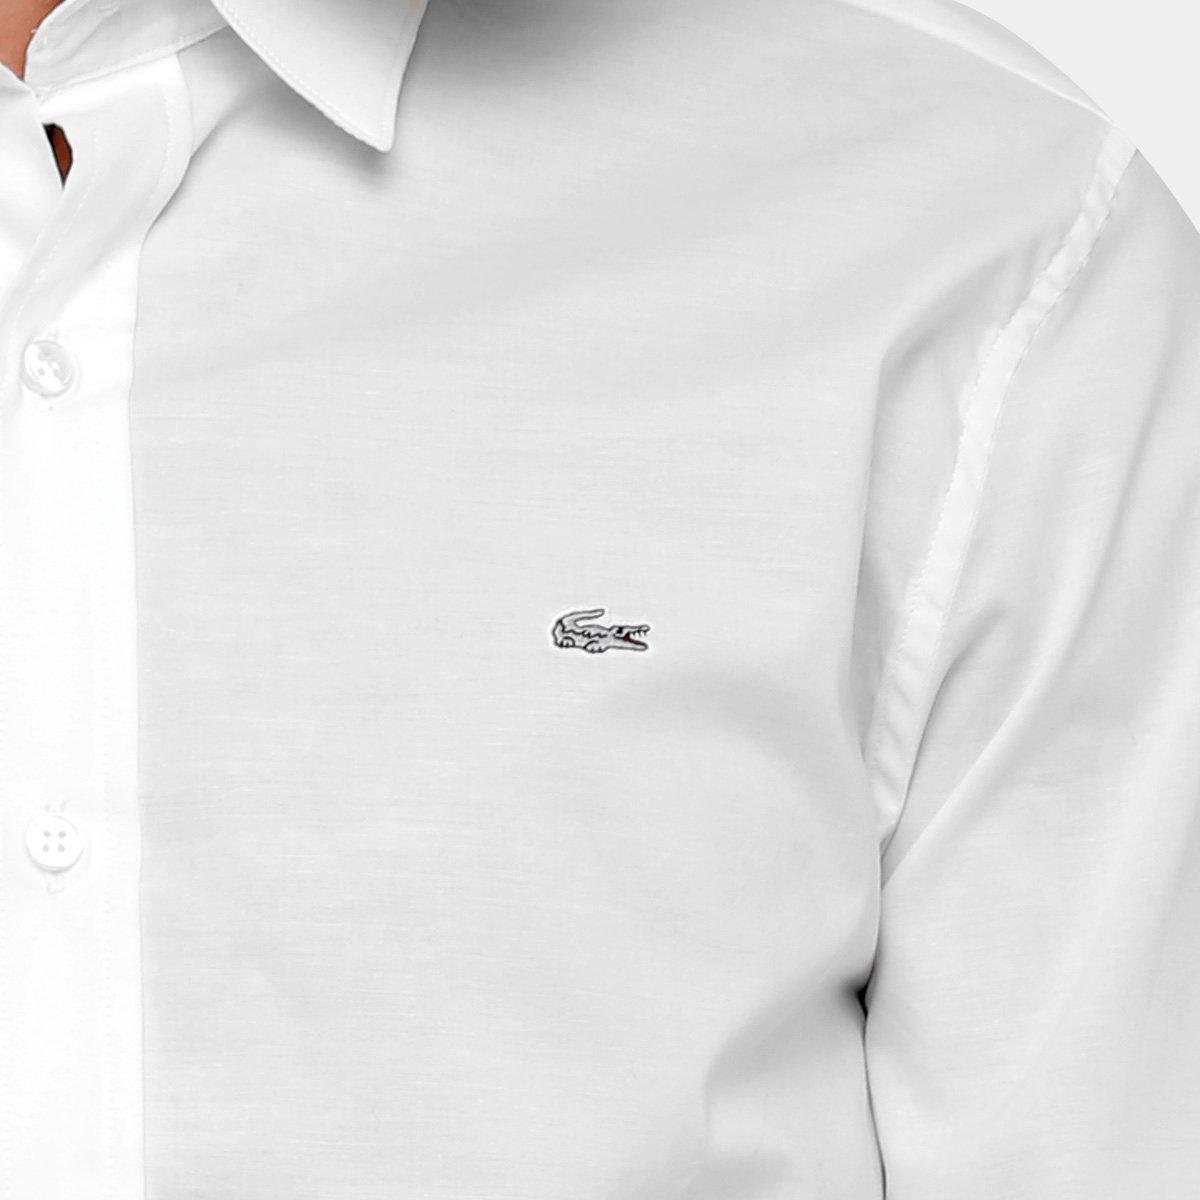 Camisa Social Lacoste Slim Fit Lisa Masculina - Compre Agora   Zattini 4095f54c26